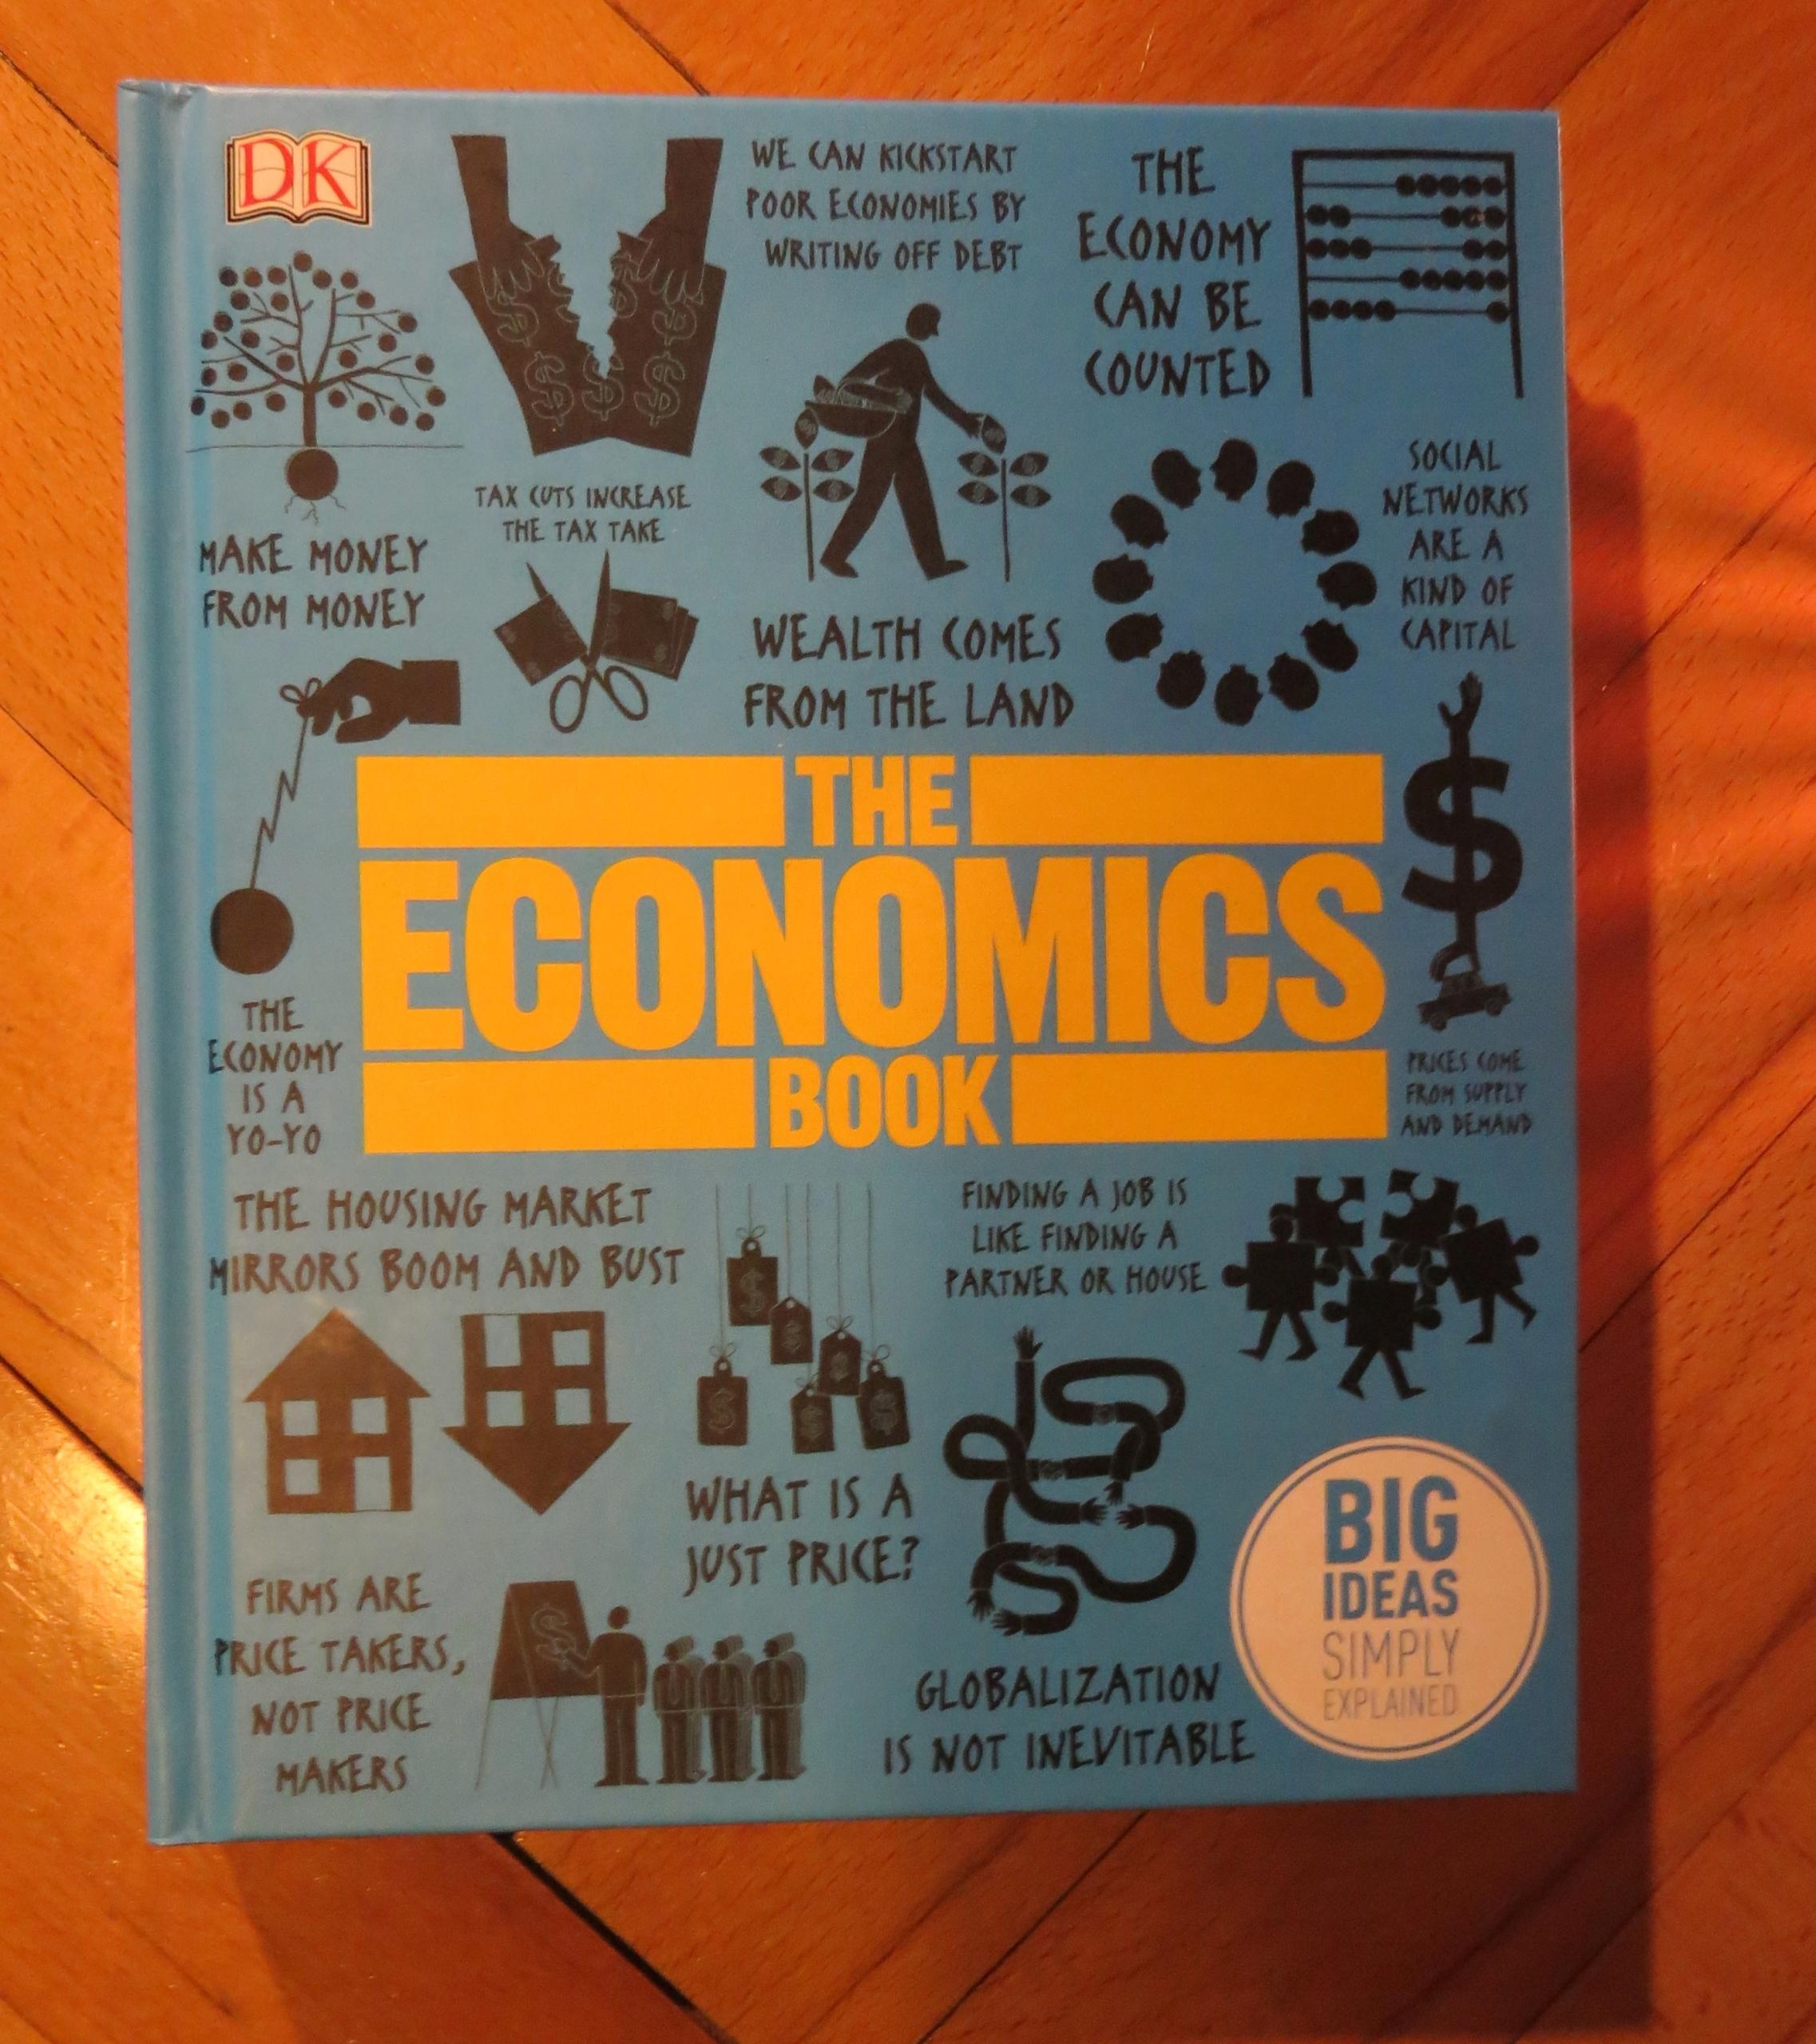 The Economics Book Big Ideas Simply Explained Economic Conditions Economics Books Business Investing